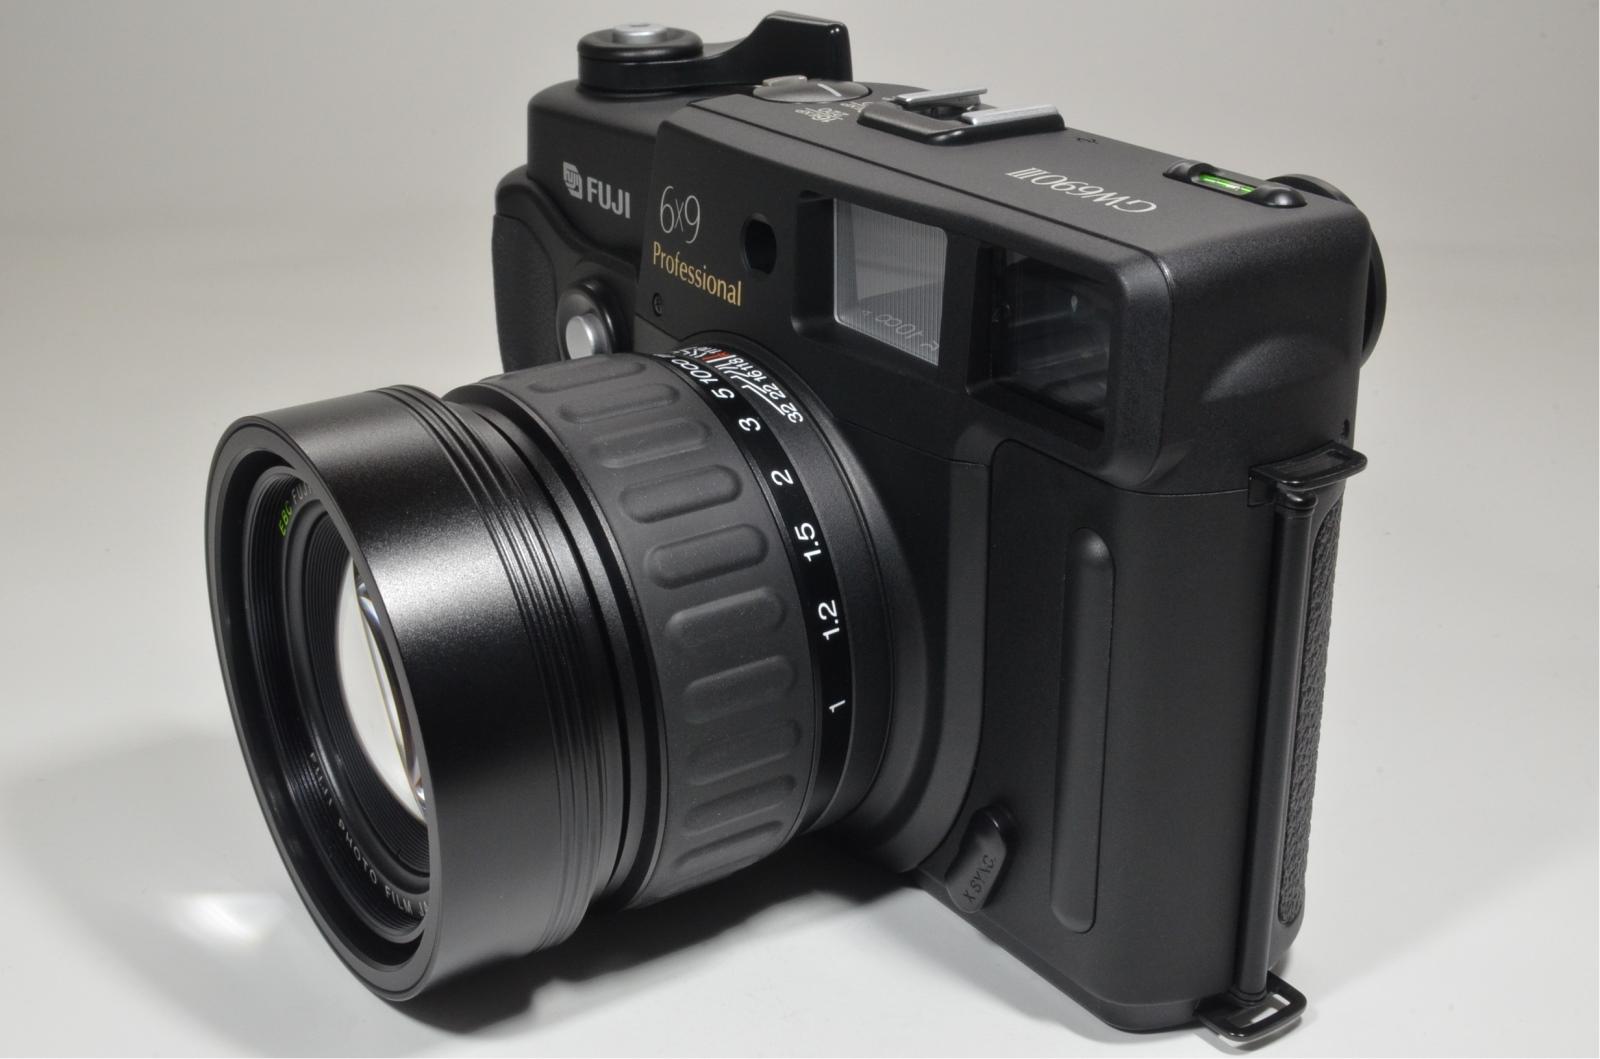 fuji fujifilm gw690iii 90mm f3.5 medium format count only '061'